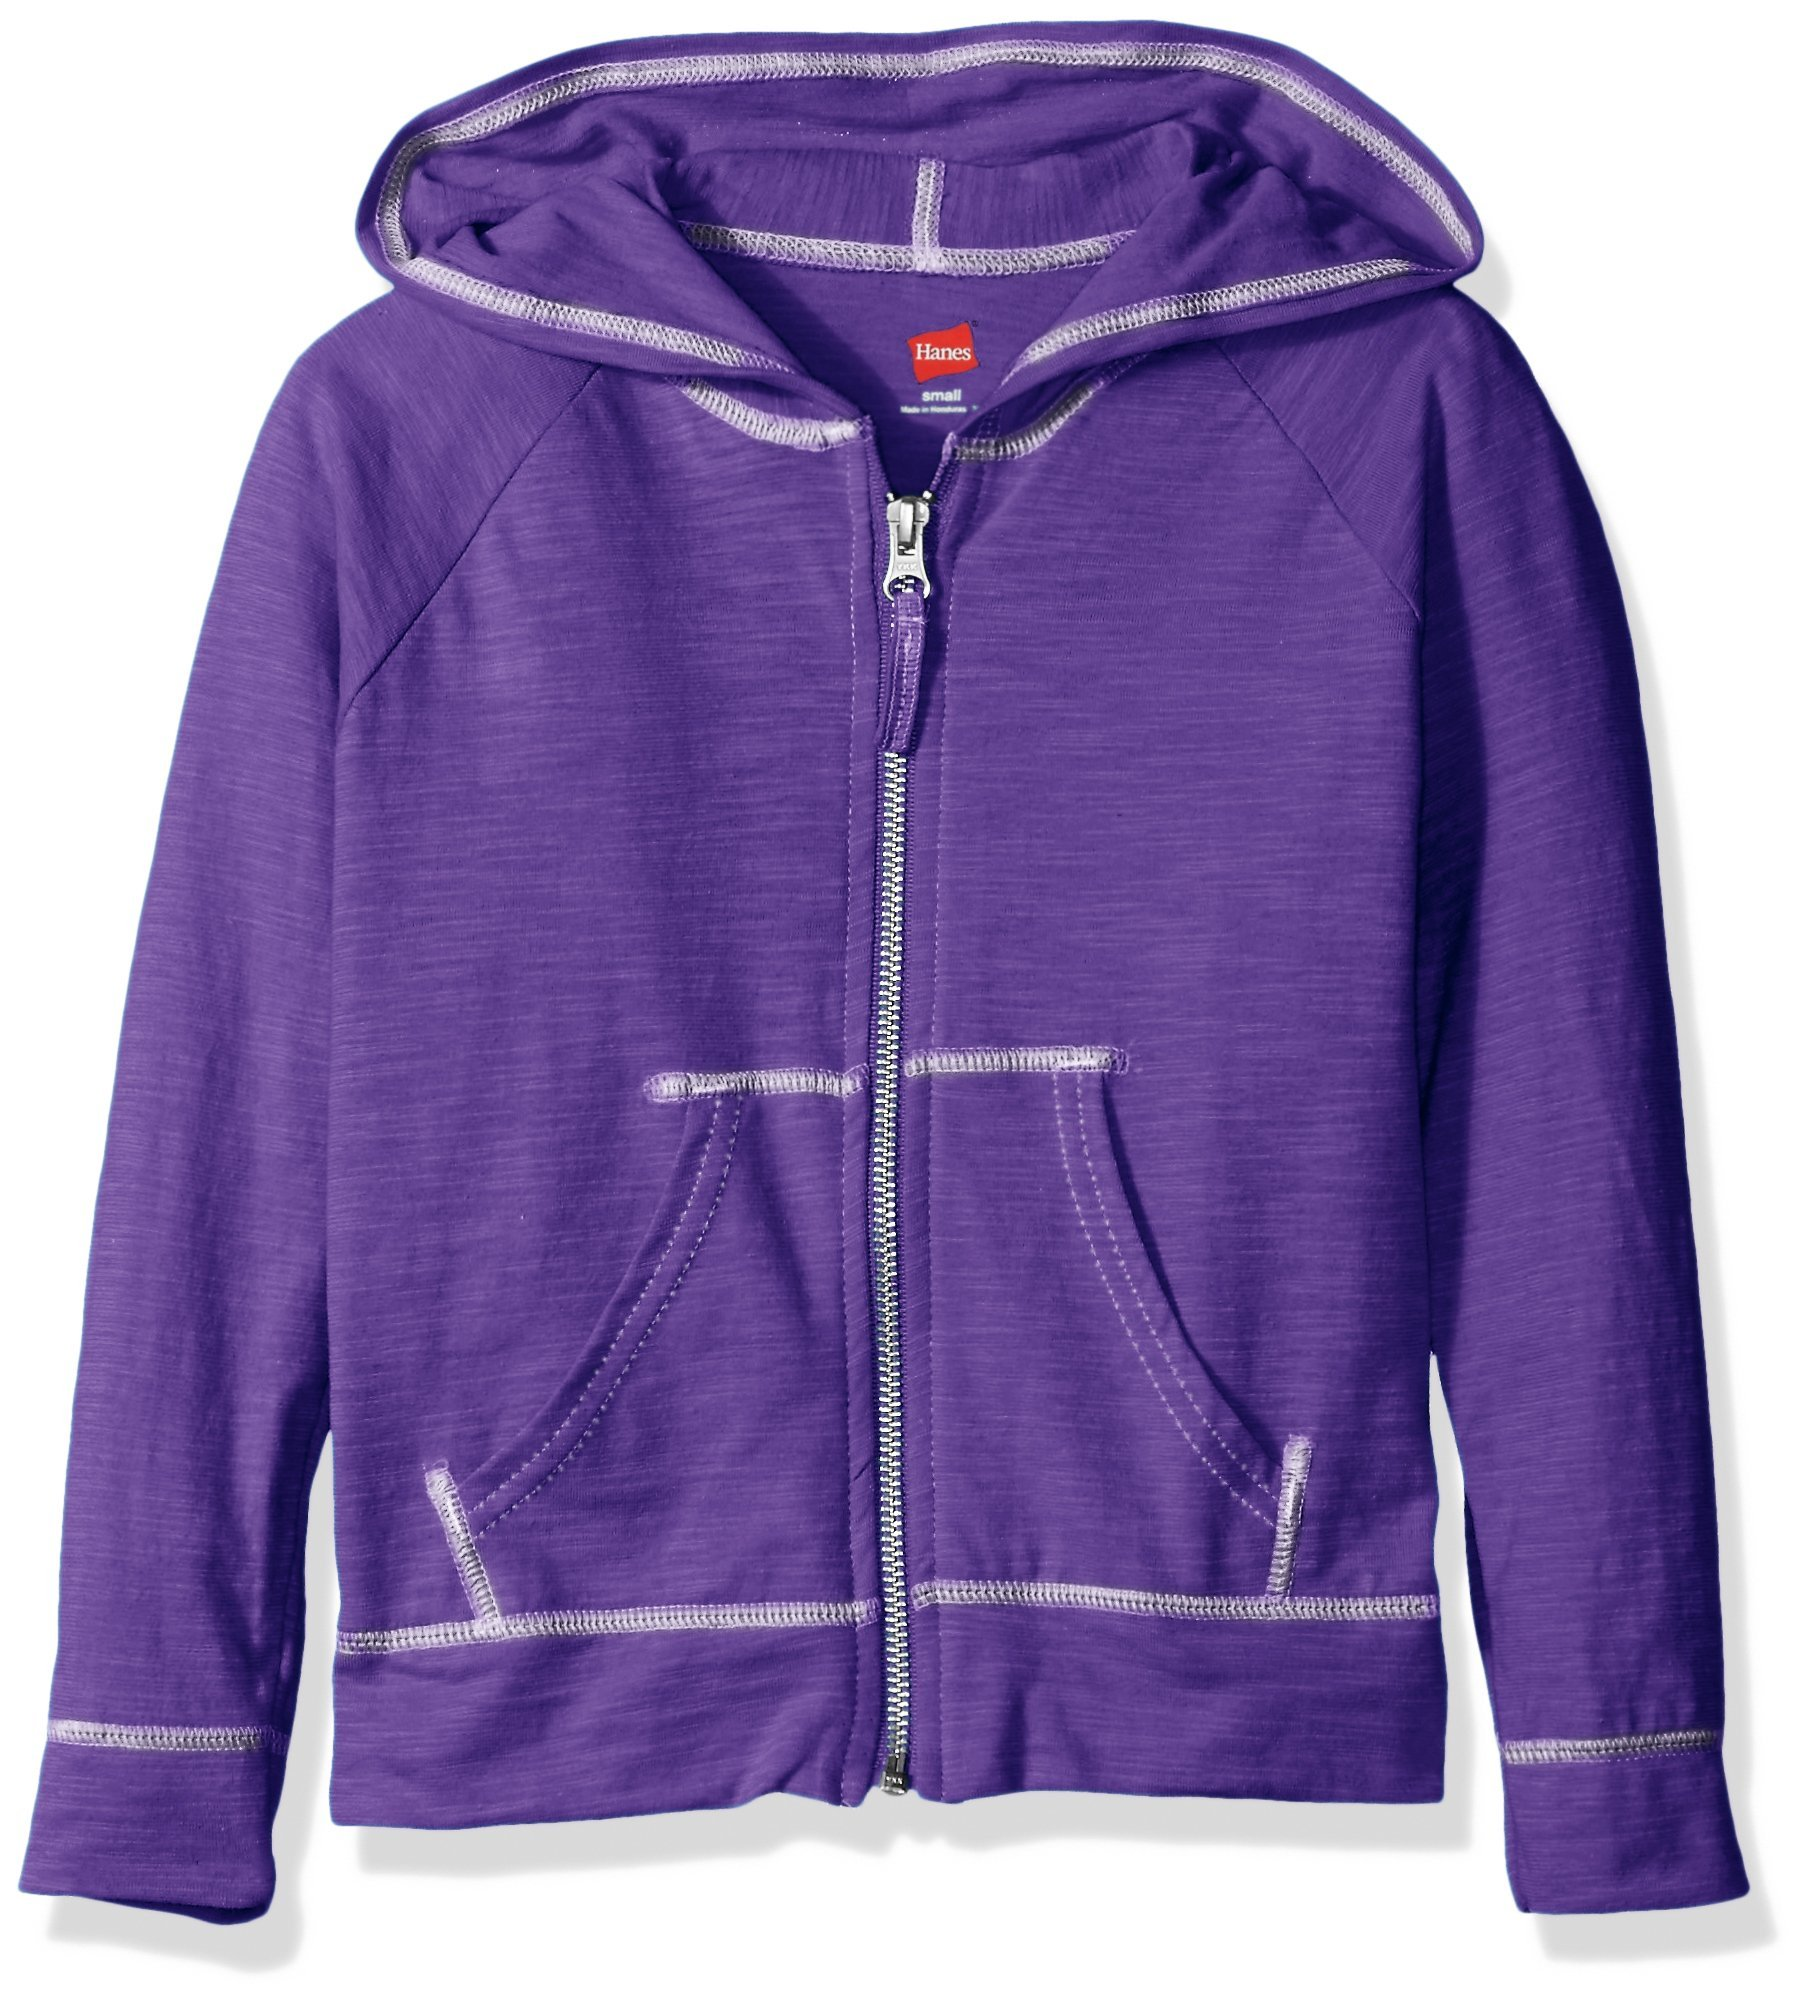 Hanes Little Girls' Slub Jersey Full Zip Jacket, Purple Crush, Small